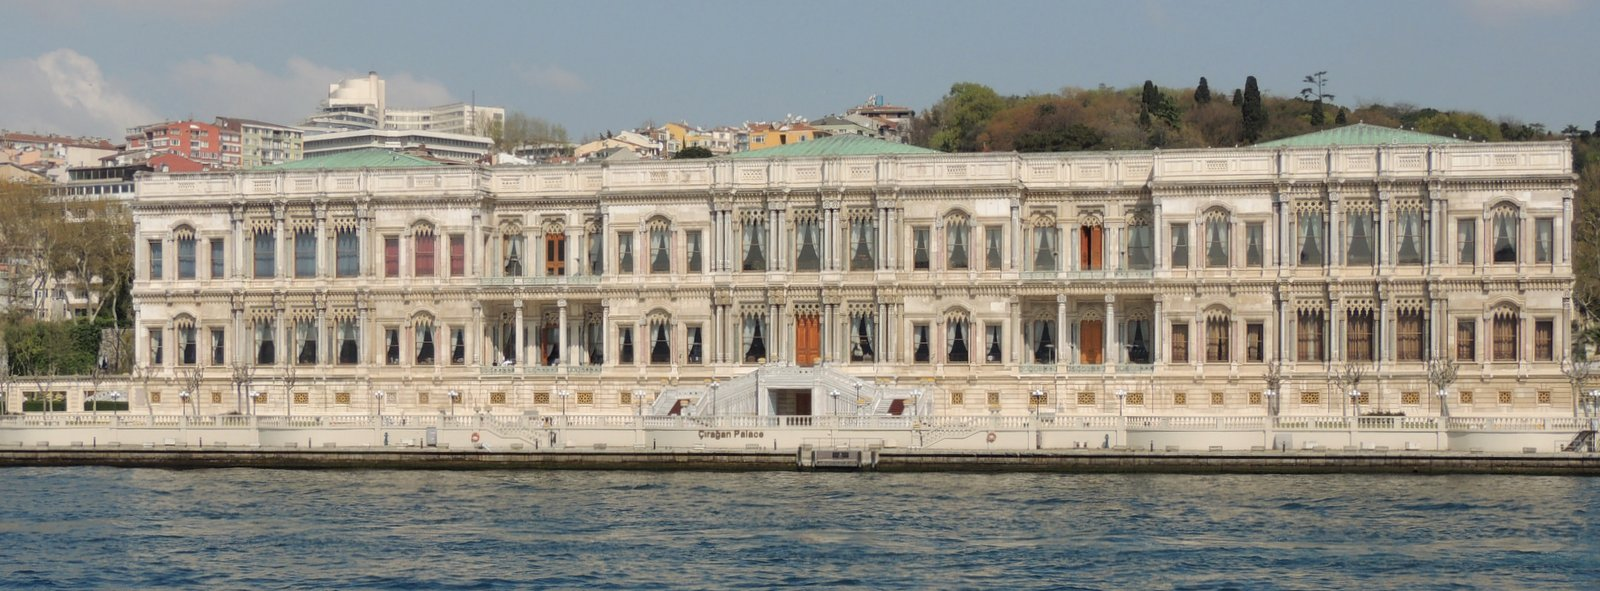 Four Seasons Hotel at the Bosporus